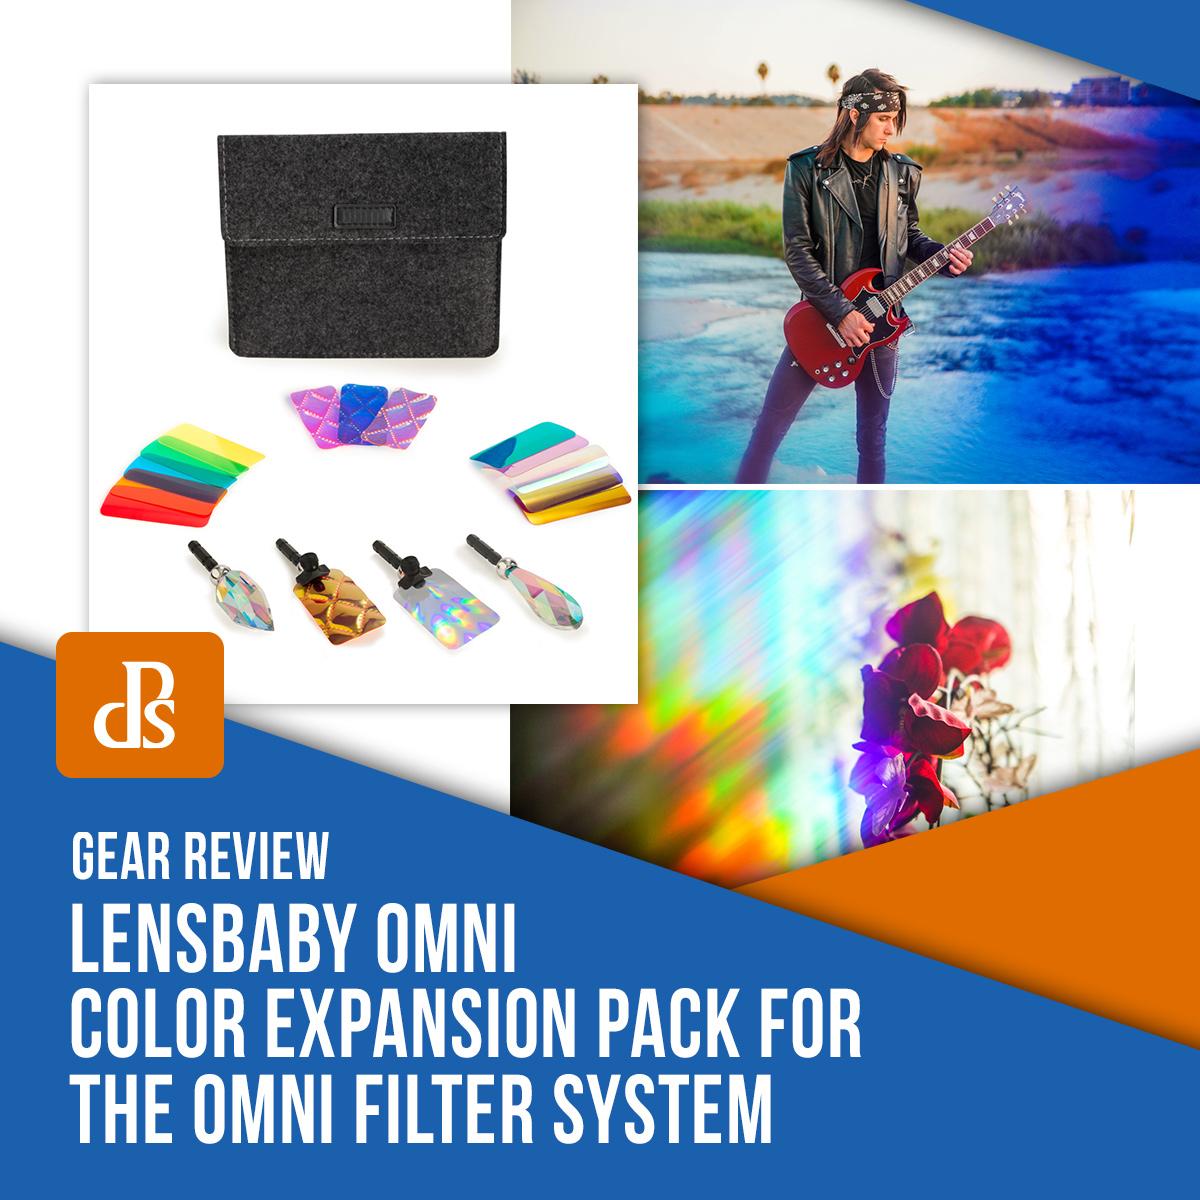 lensbaby-omni-expansion-pack